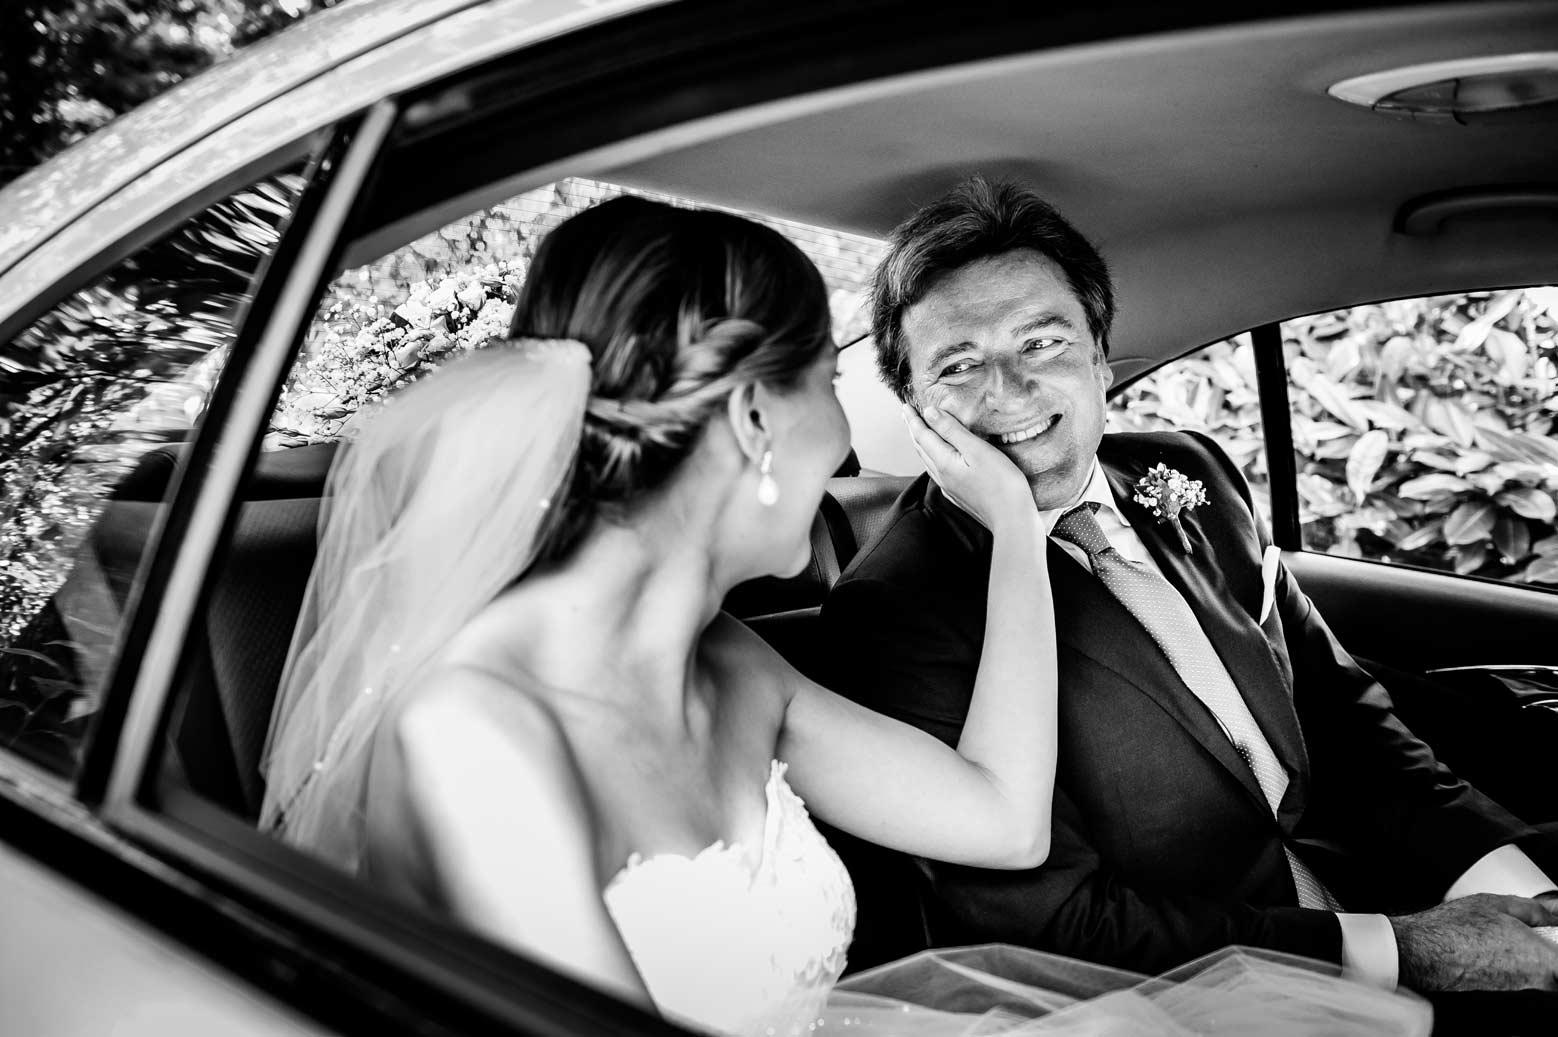 Reportage-Matrimonio-Fotografo-Preparativi-Sposa